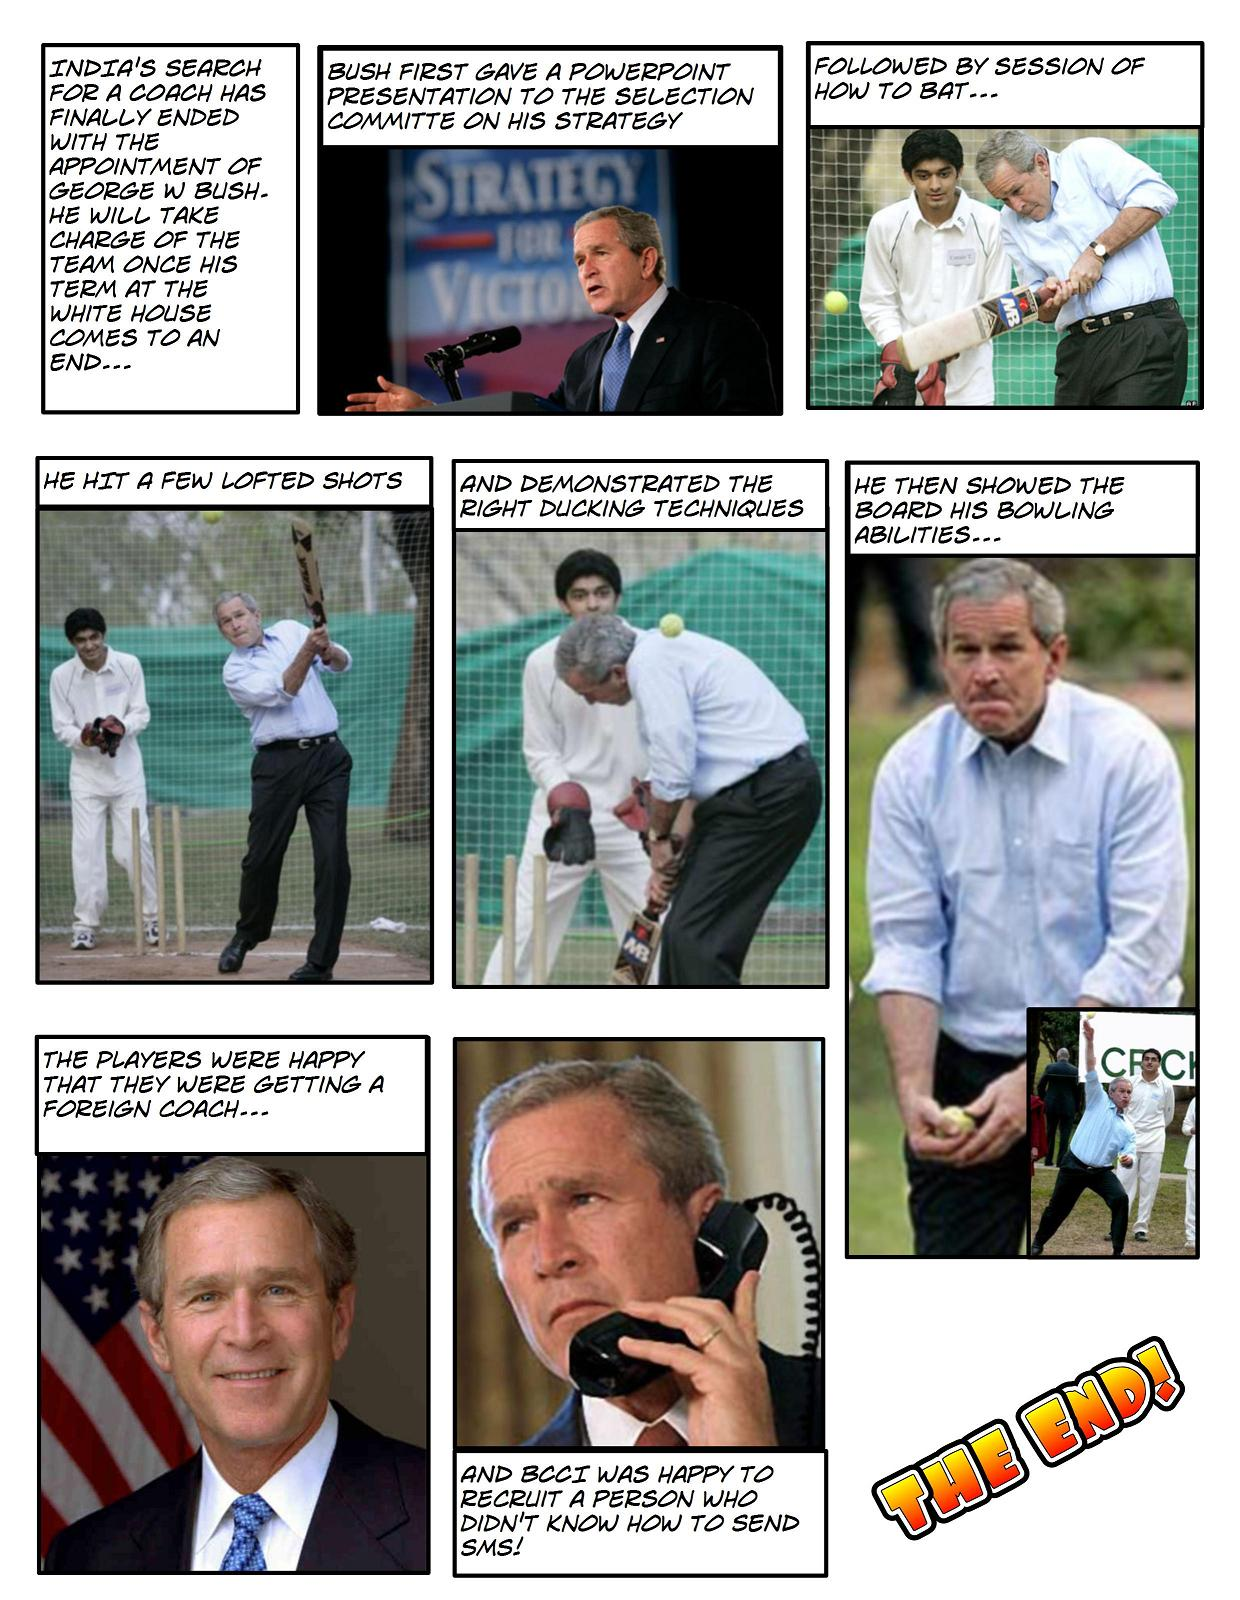 Bush as Coach